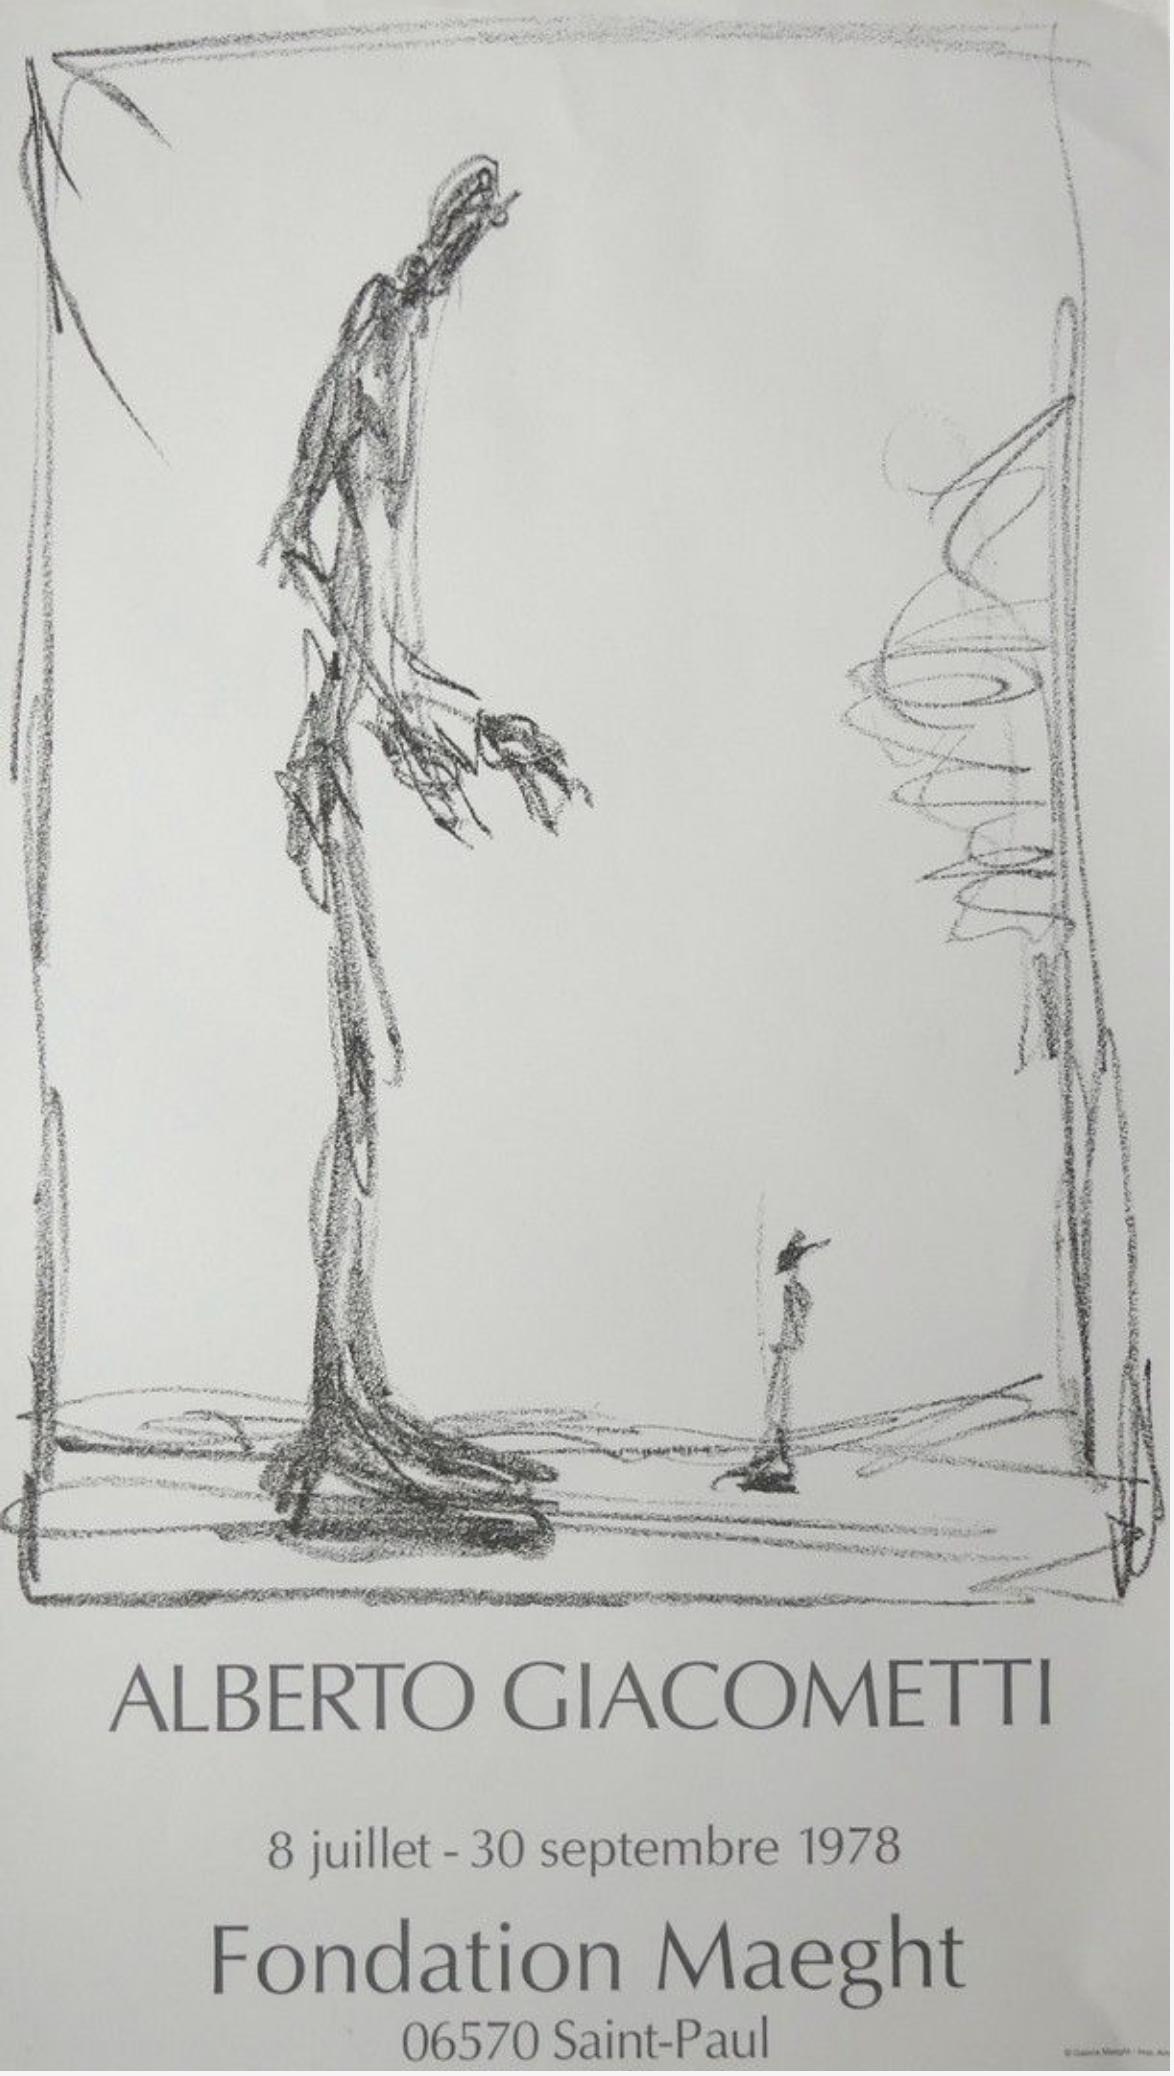 Giacometti Fondation Maeght Original Vintage Poster Letitia Morris Gallery